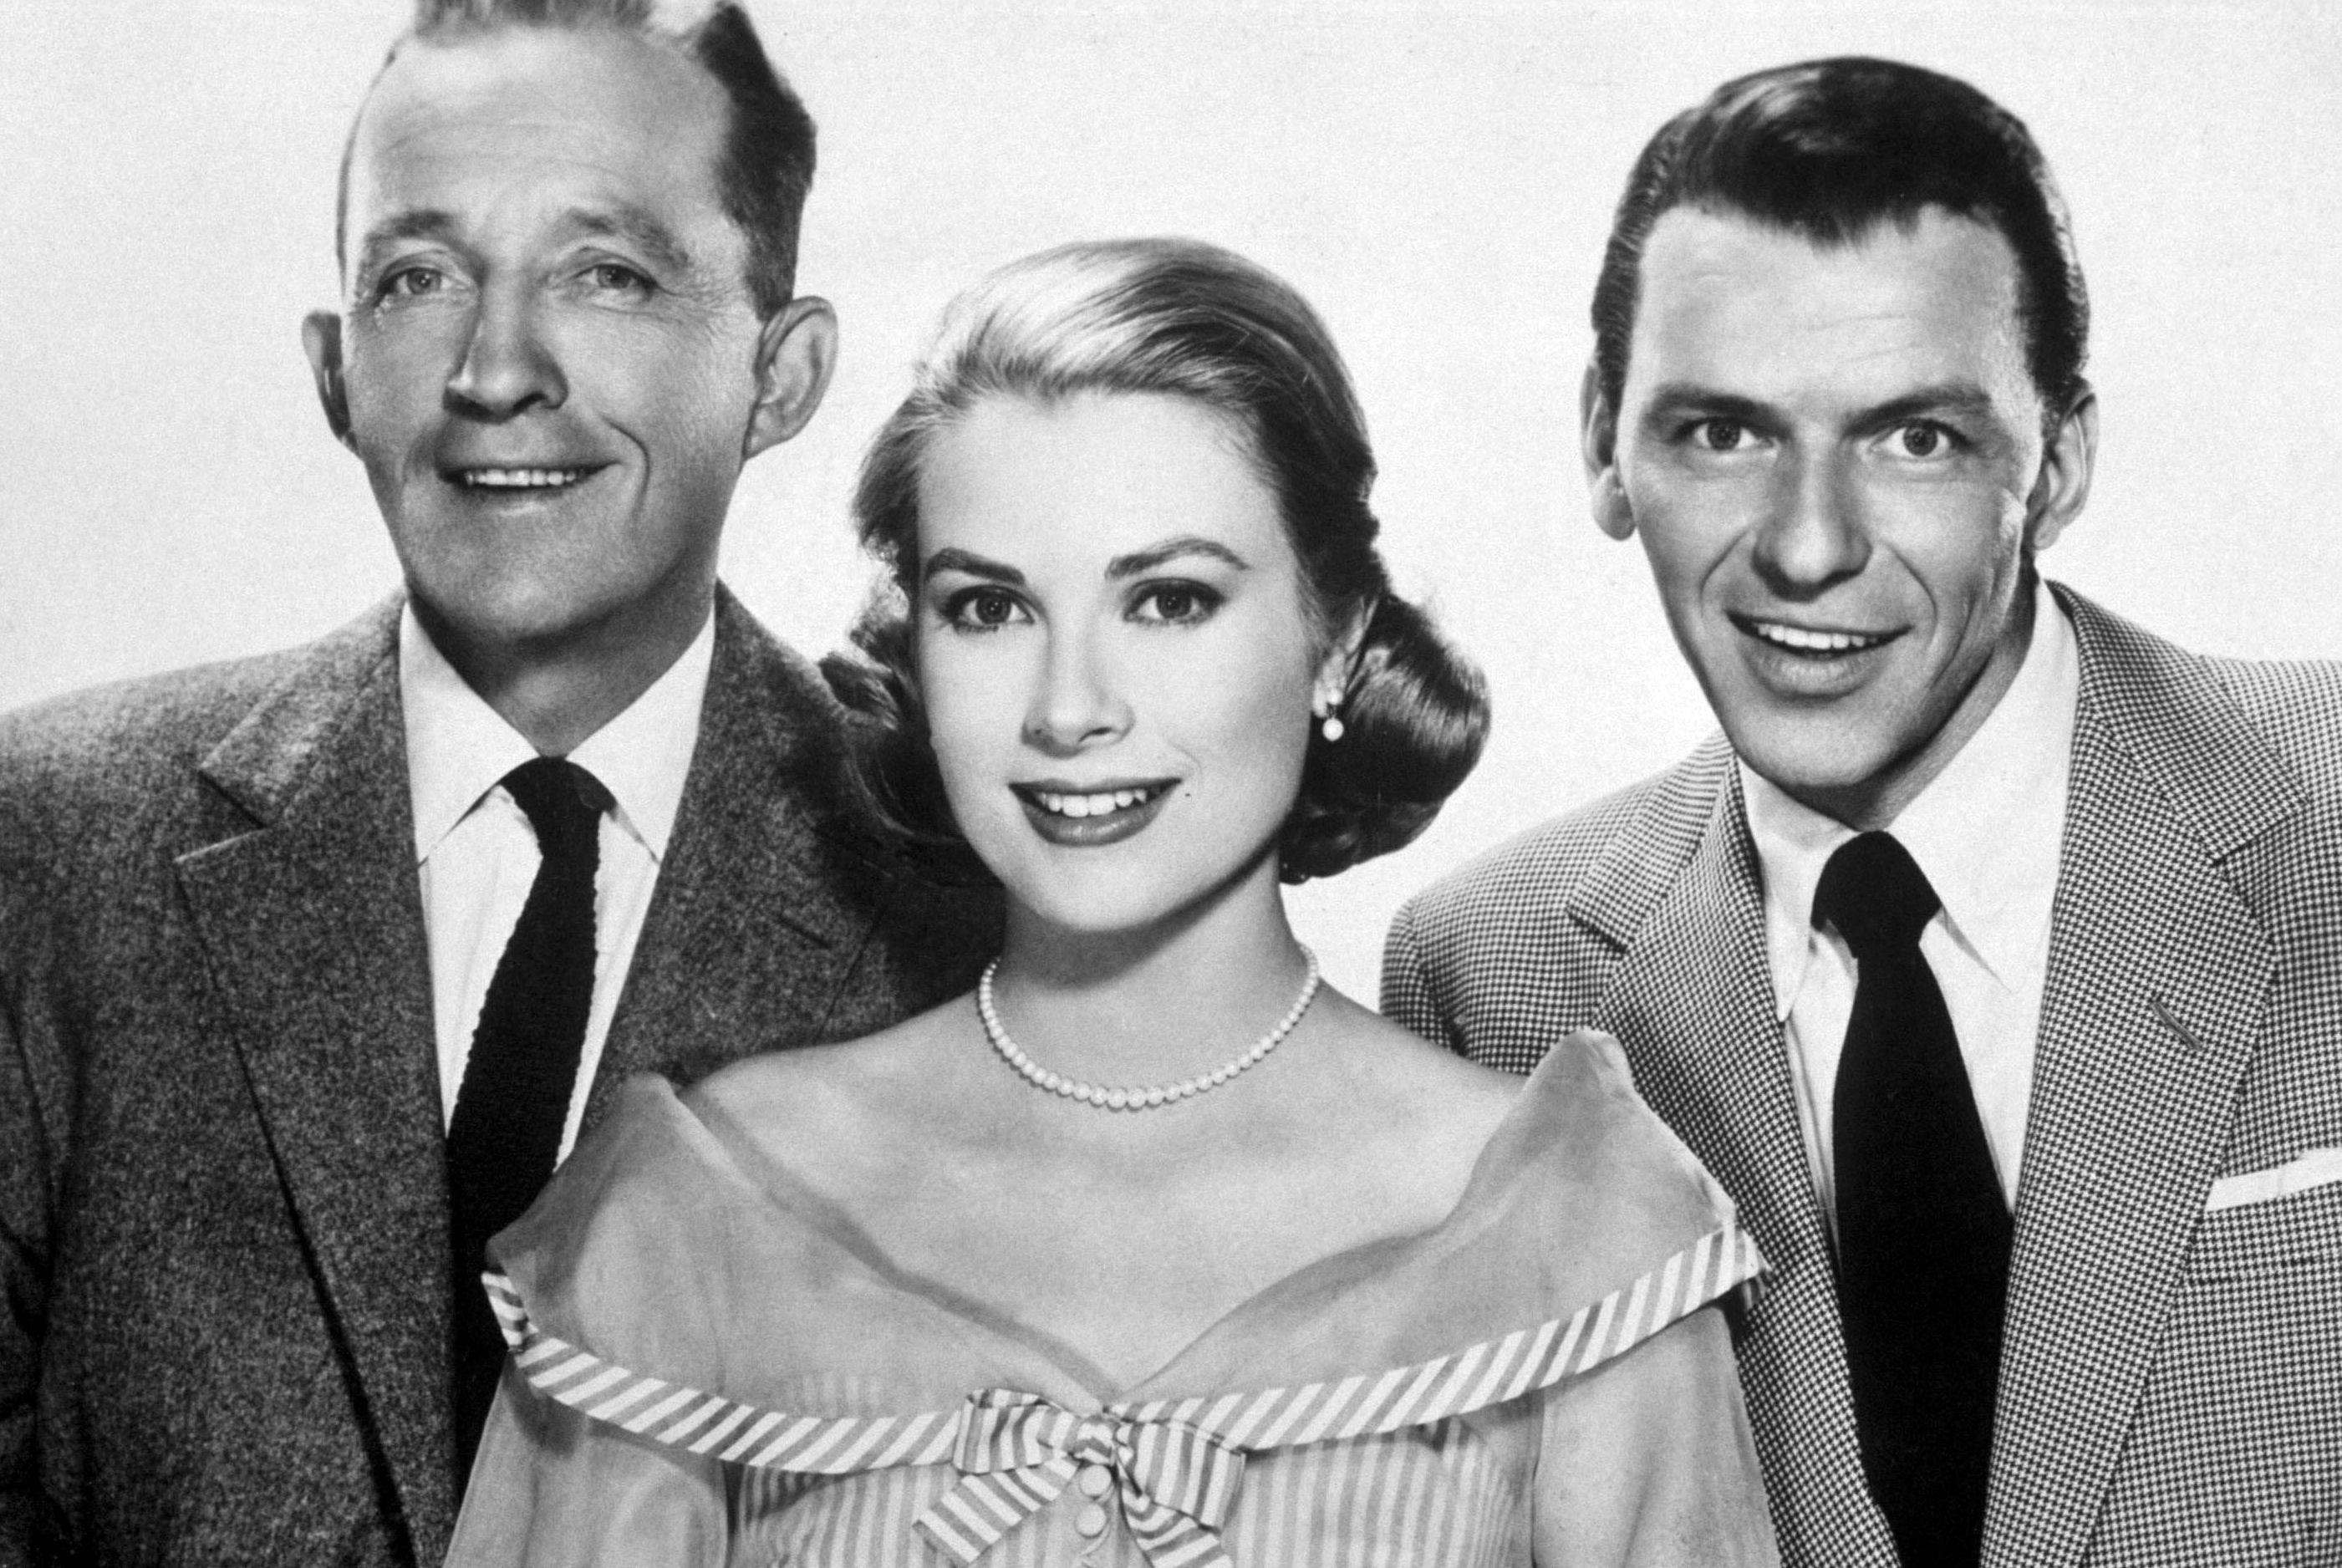 Alta società: Frank Sinatra, Bing Crosby e Grace Kelly